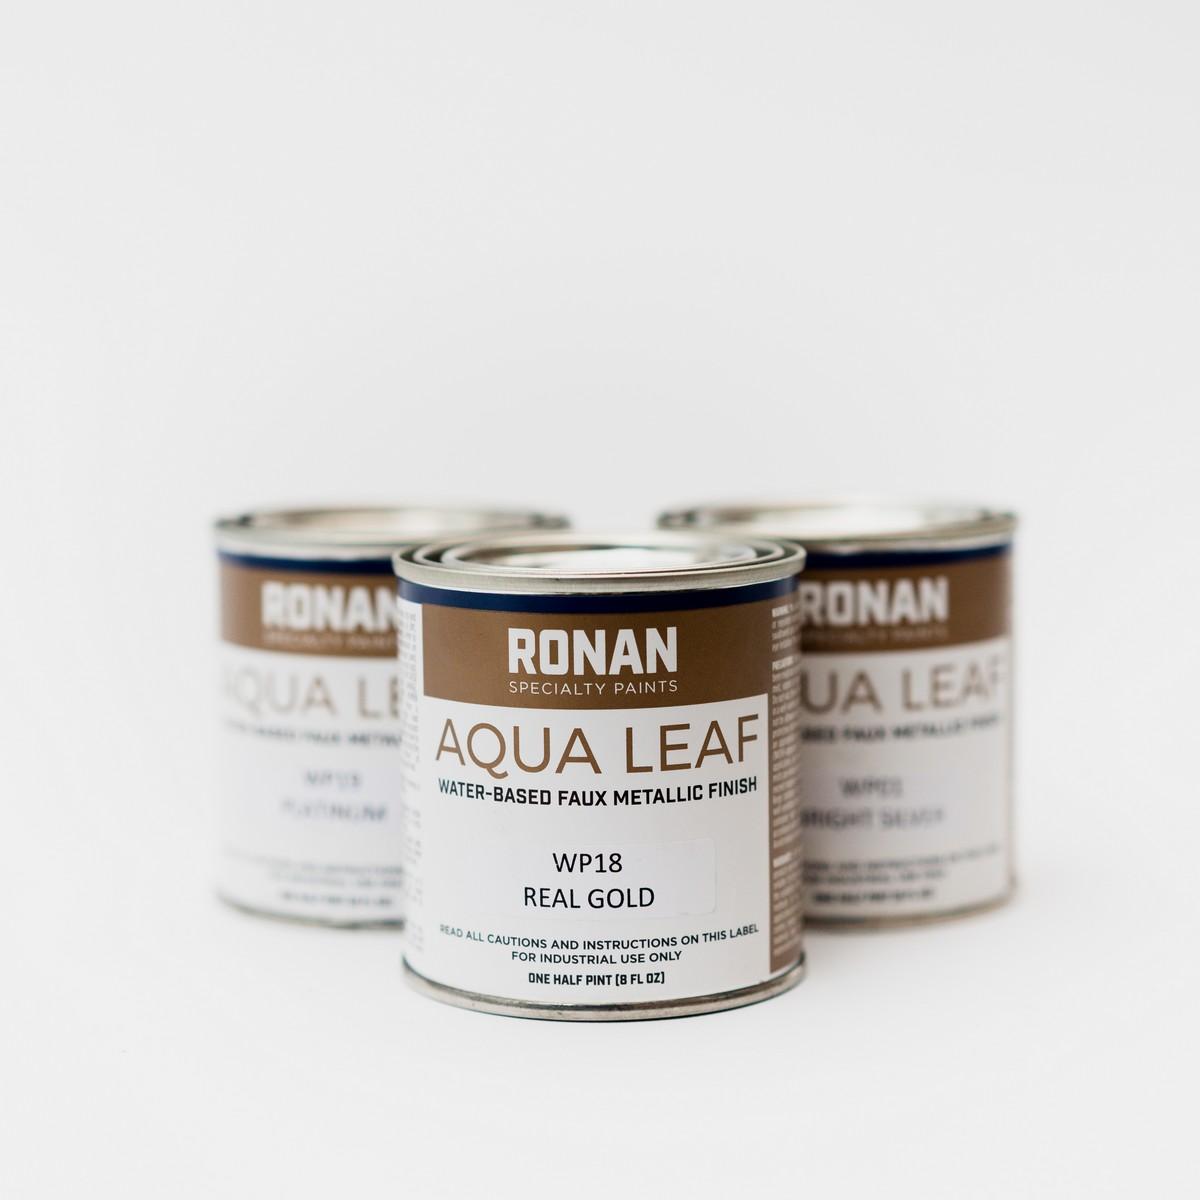 Ronan Aqua Leaf - metallic signwriting water based enamel